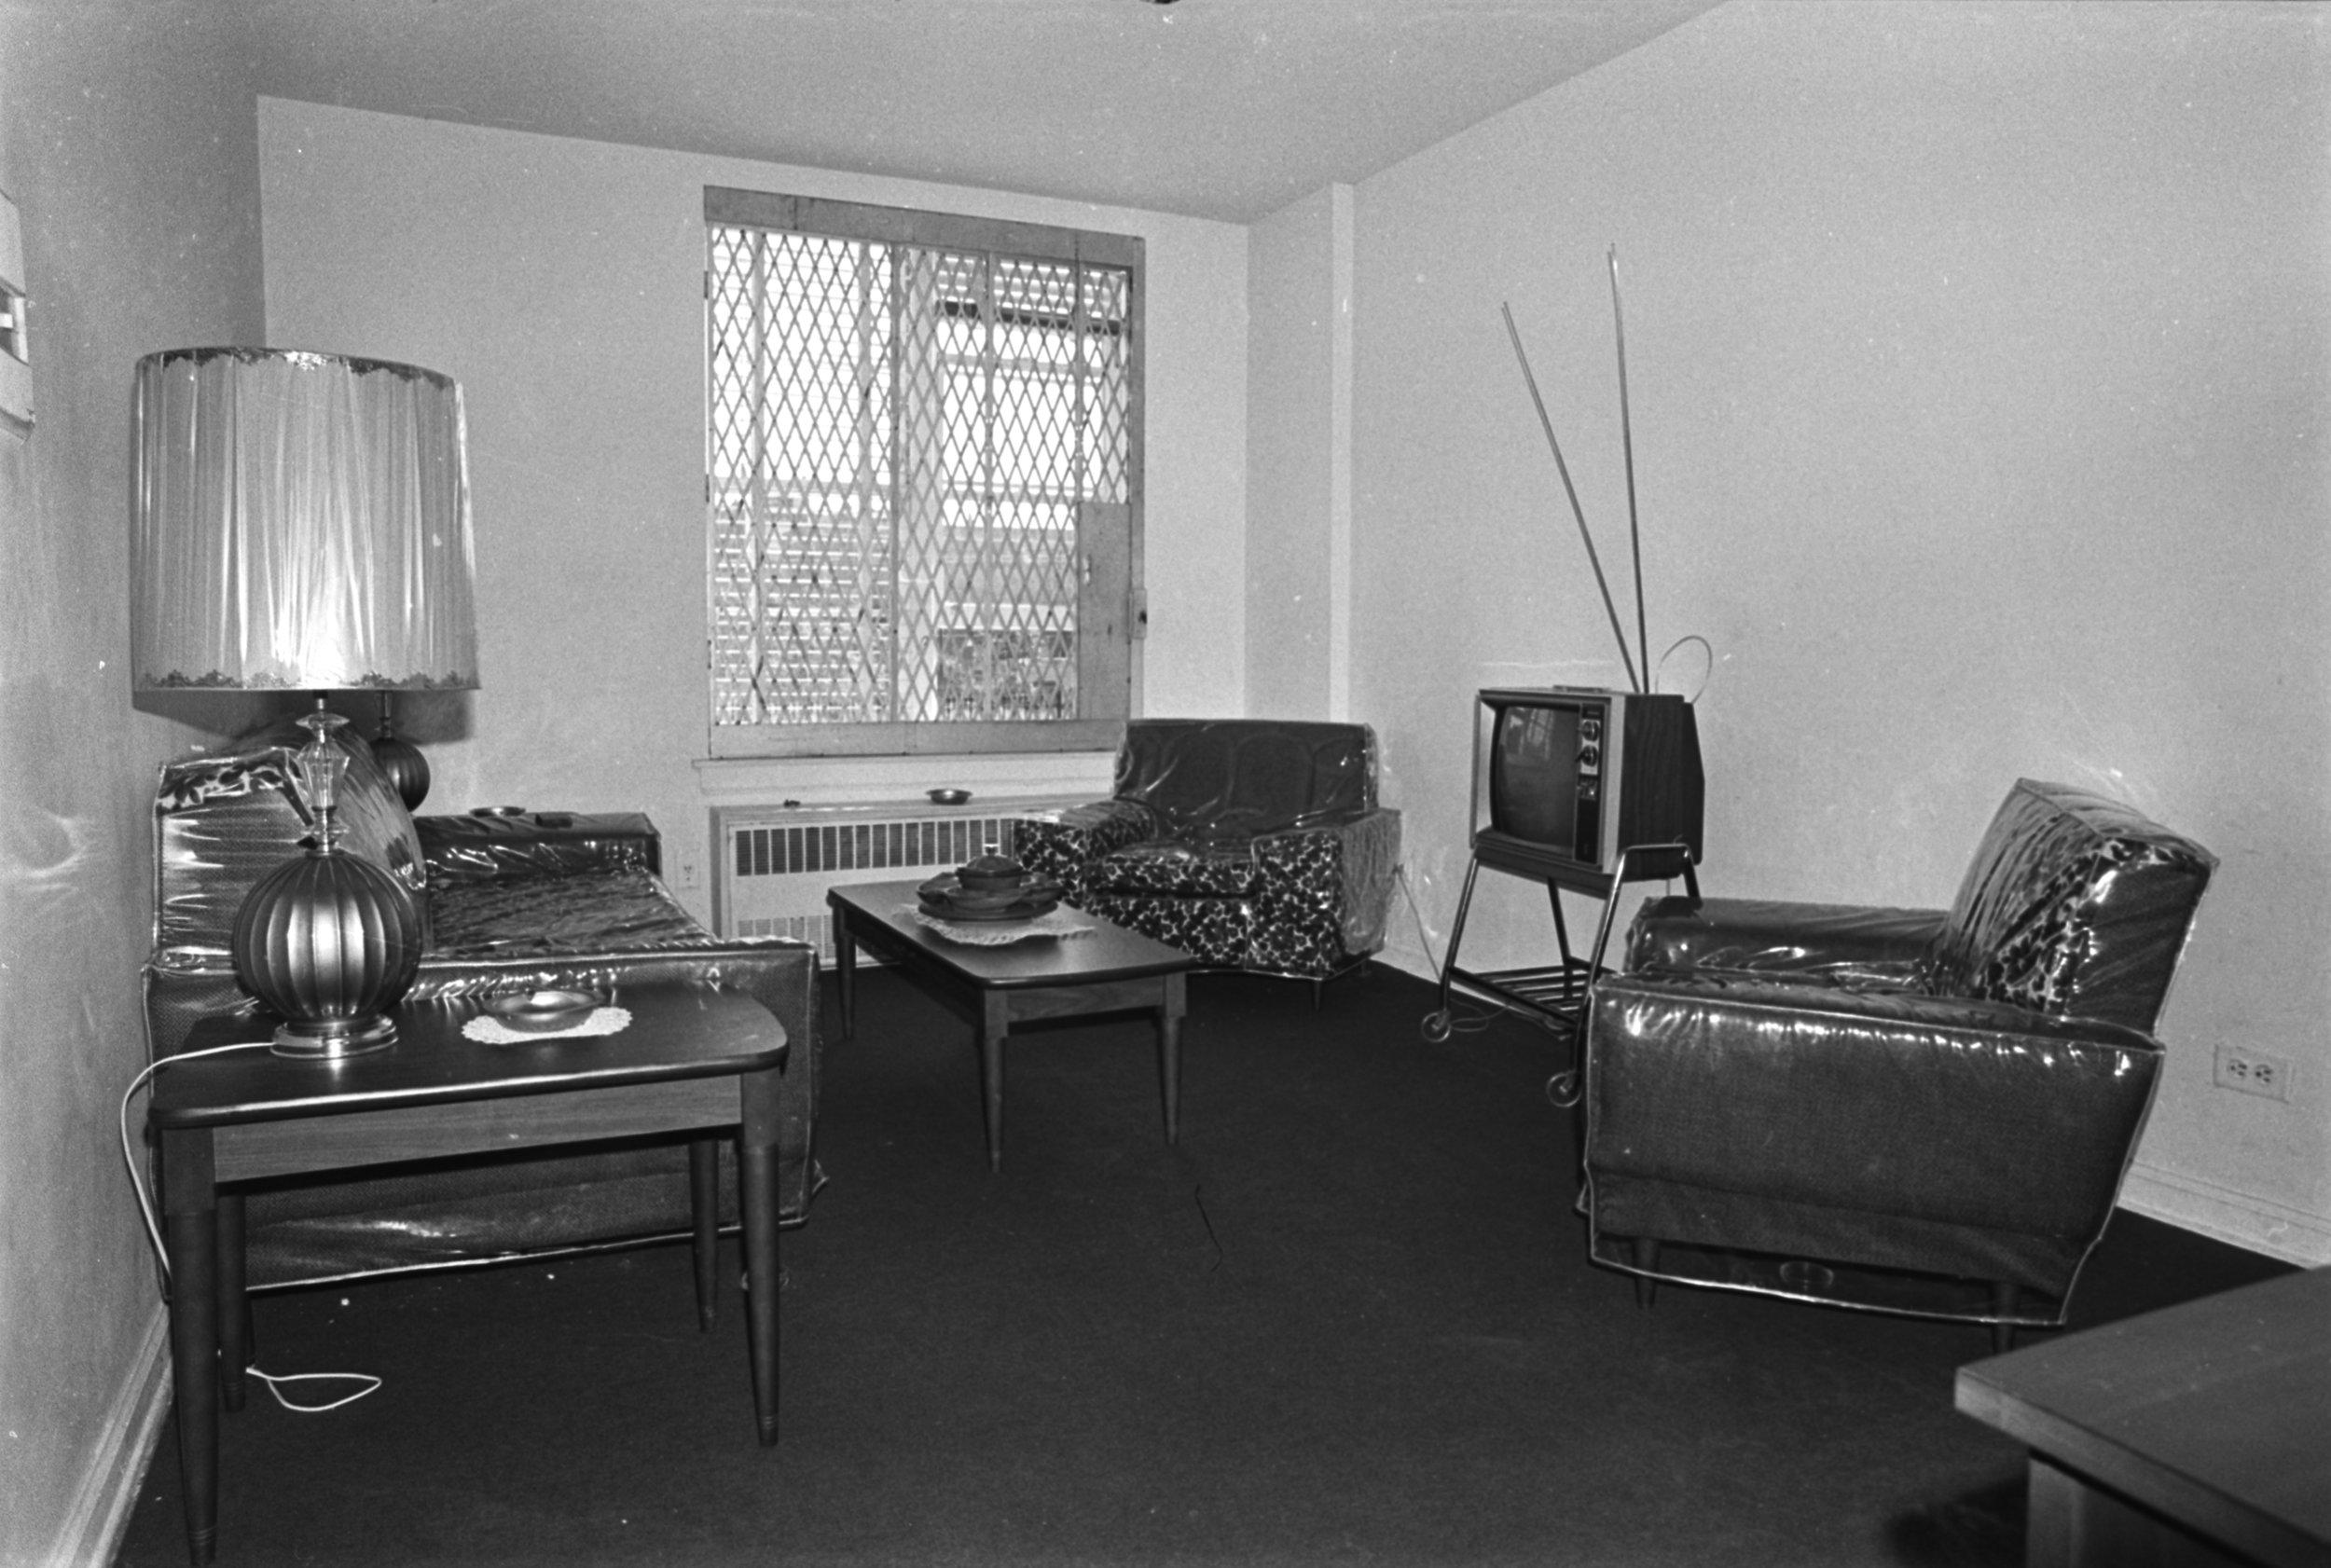 Klaus Rehabilitation on South 1st Street, Williamsburg, Brooklyn, October 1971. Photograph by Leonard Boykin.